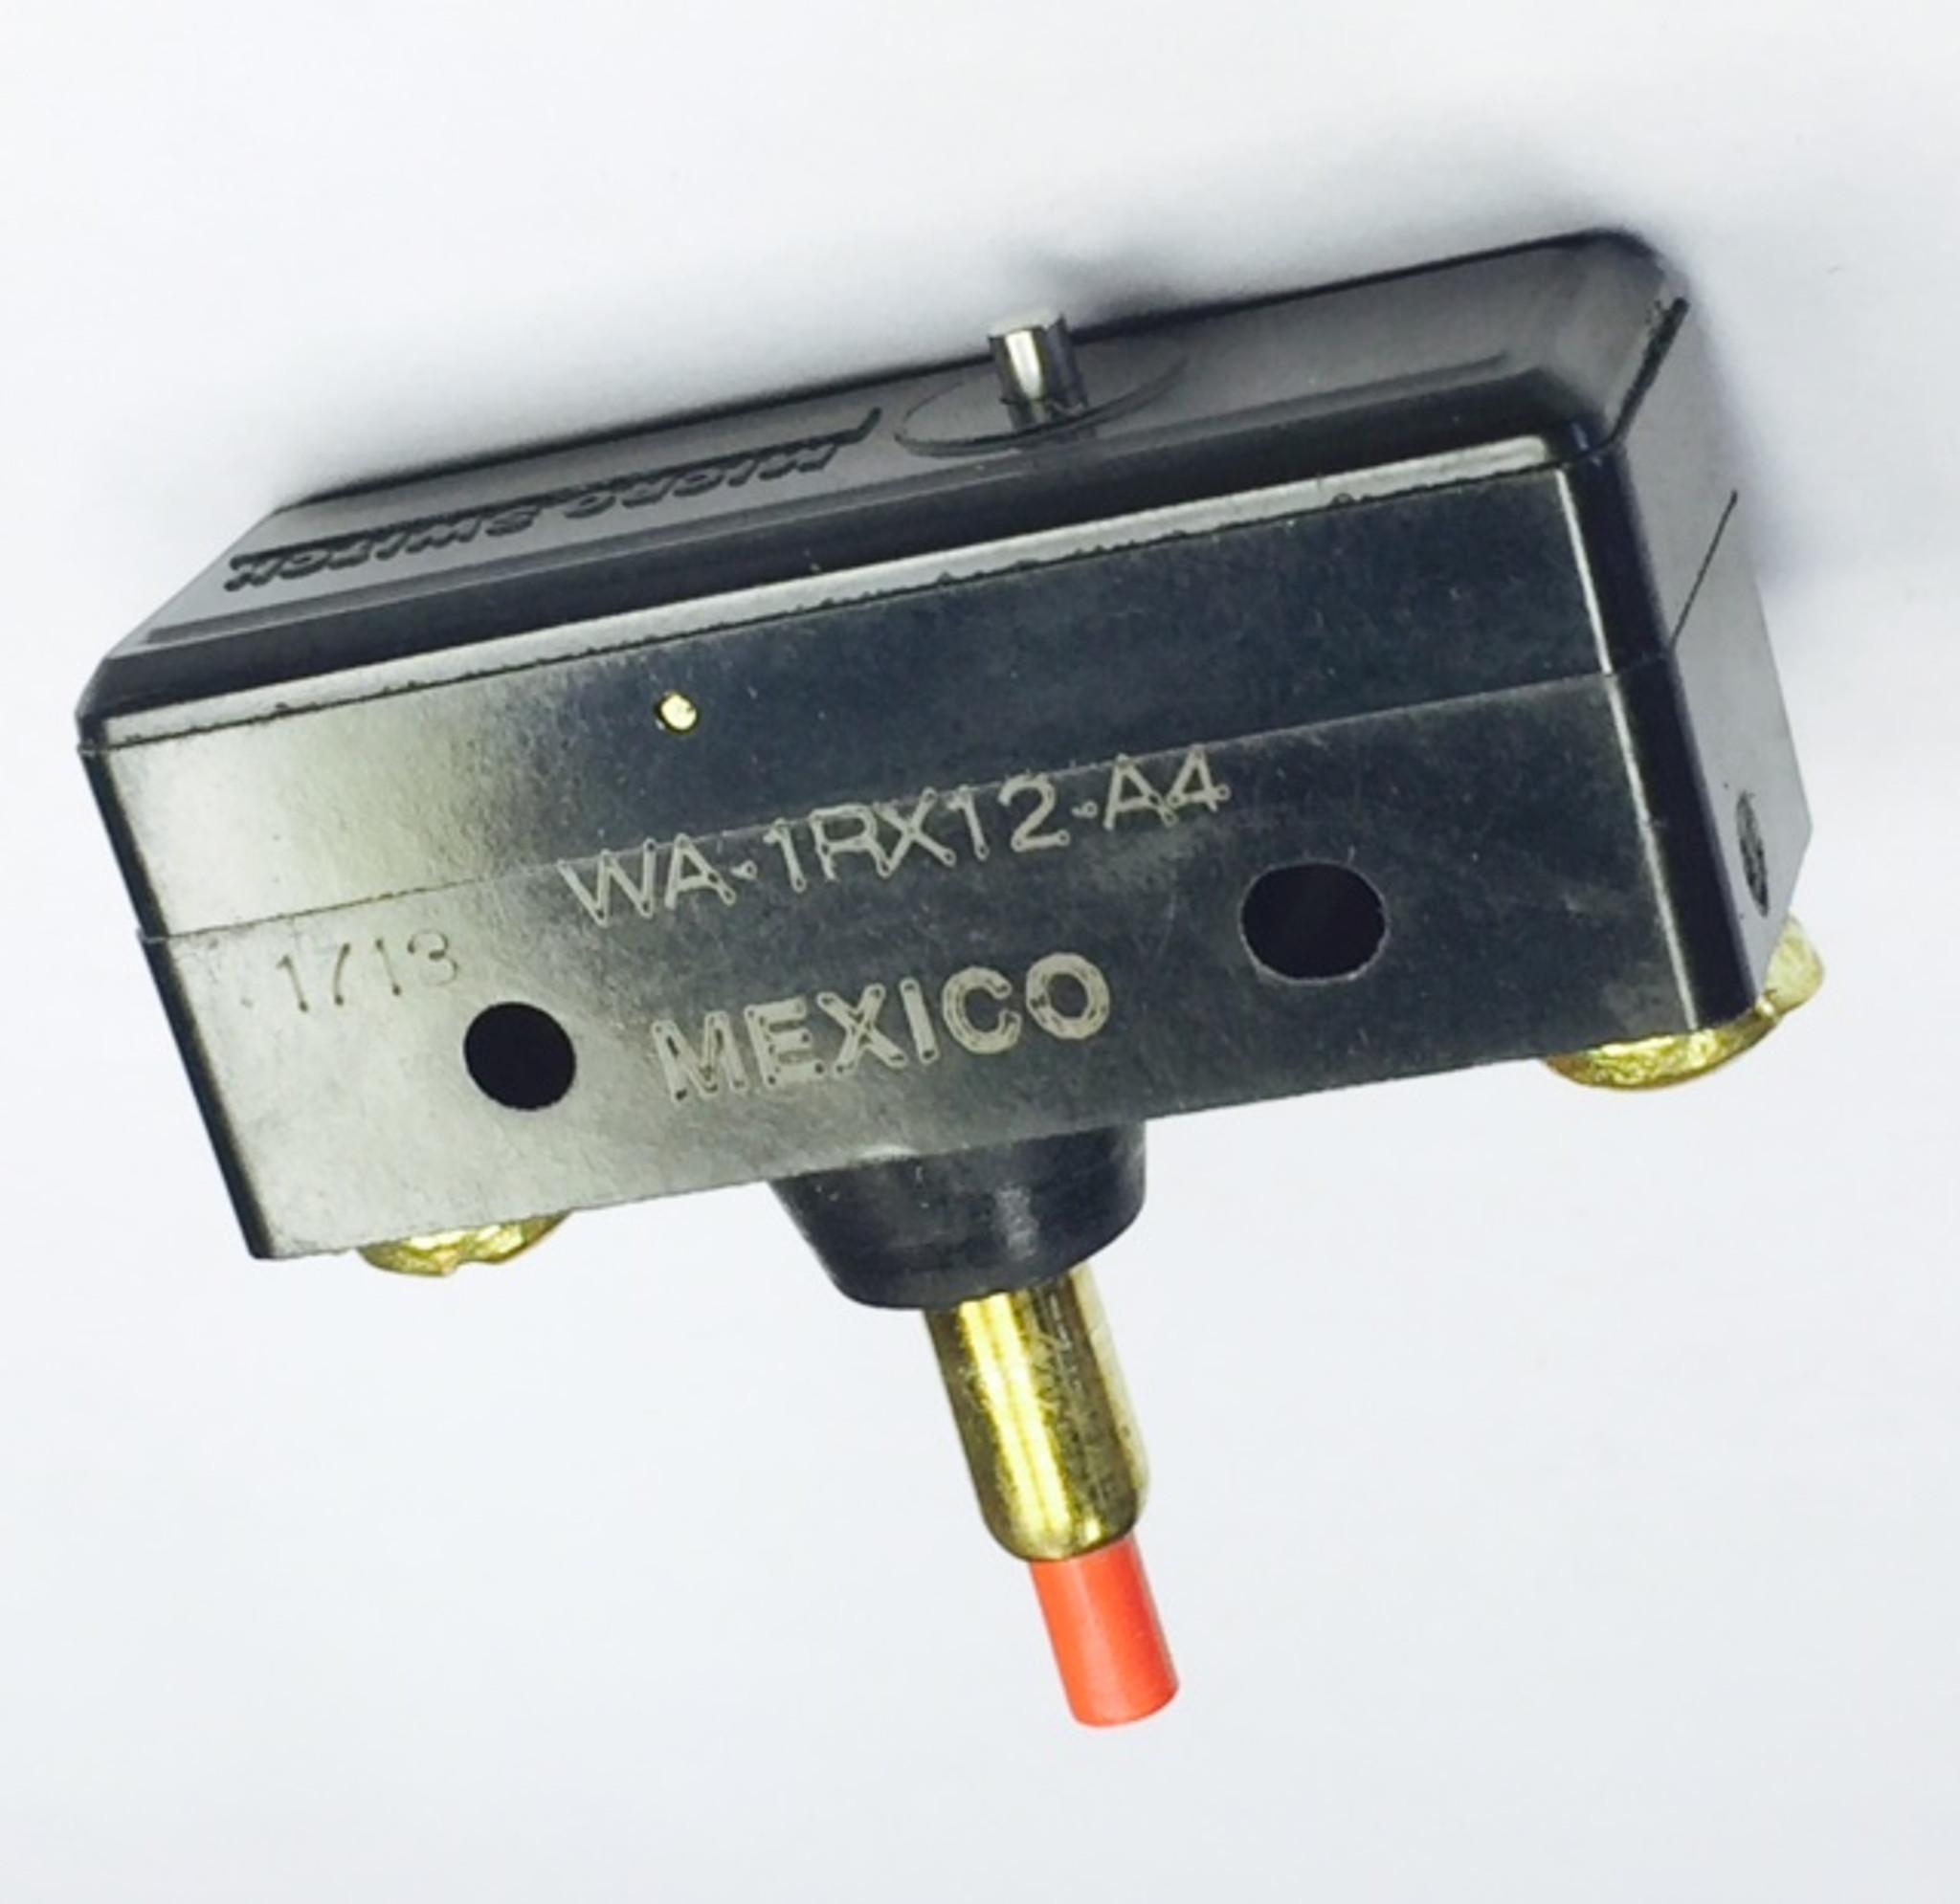 WA-1RX12-A41 MICRO SWITCH//Honeywell SWITCH SNAP ACT SPST-NC 20A 125V